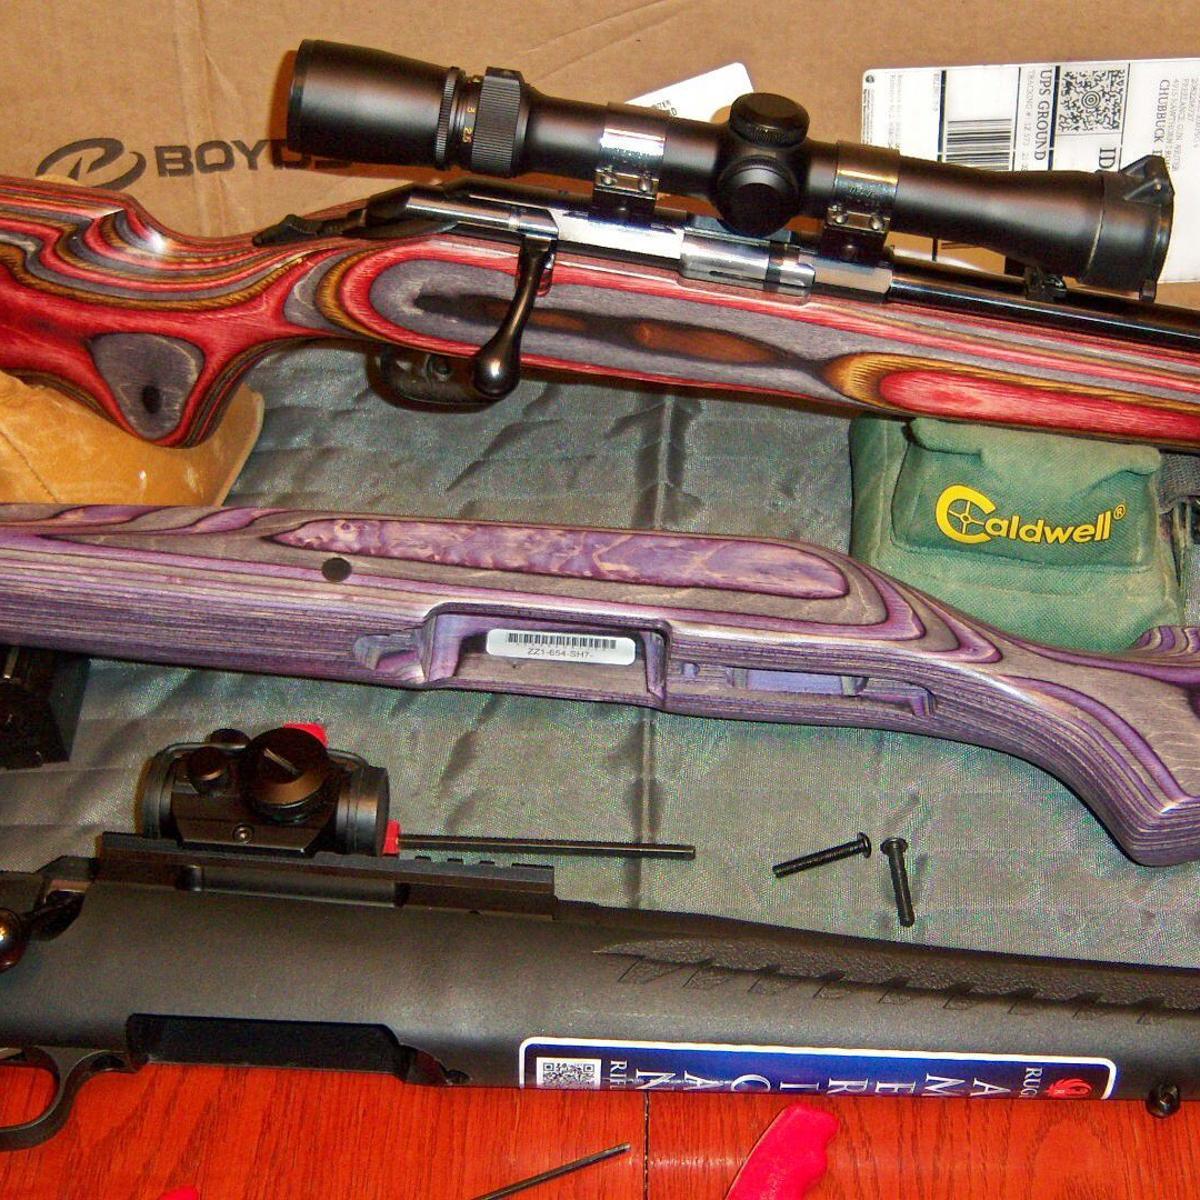 Boyds' Gunstock is bullish in the replacement gun stock market